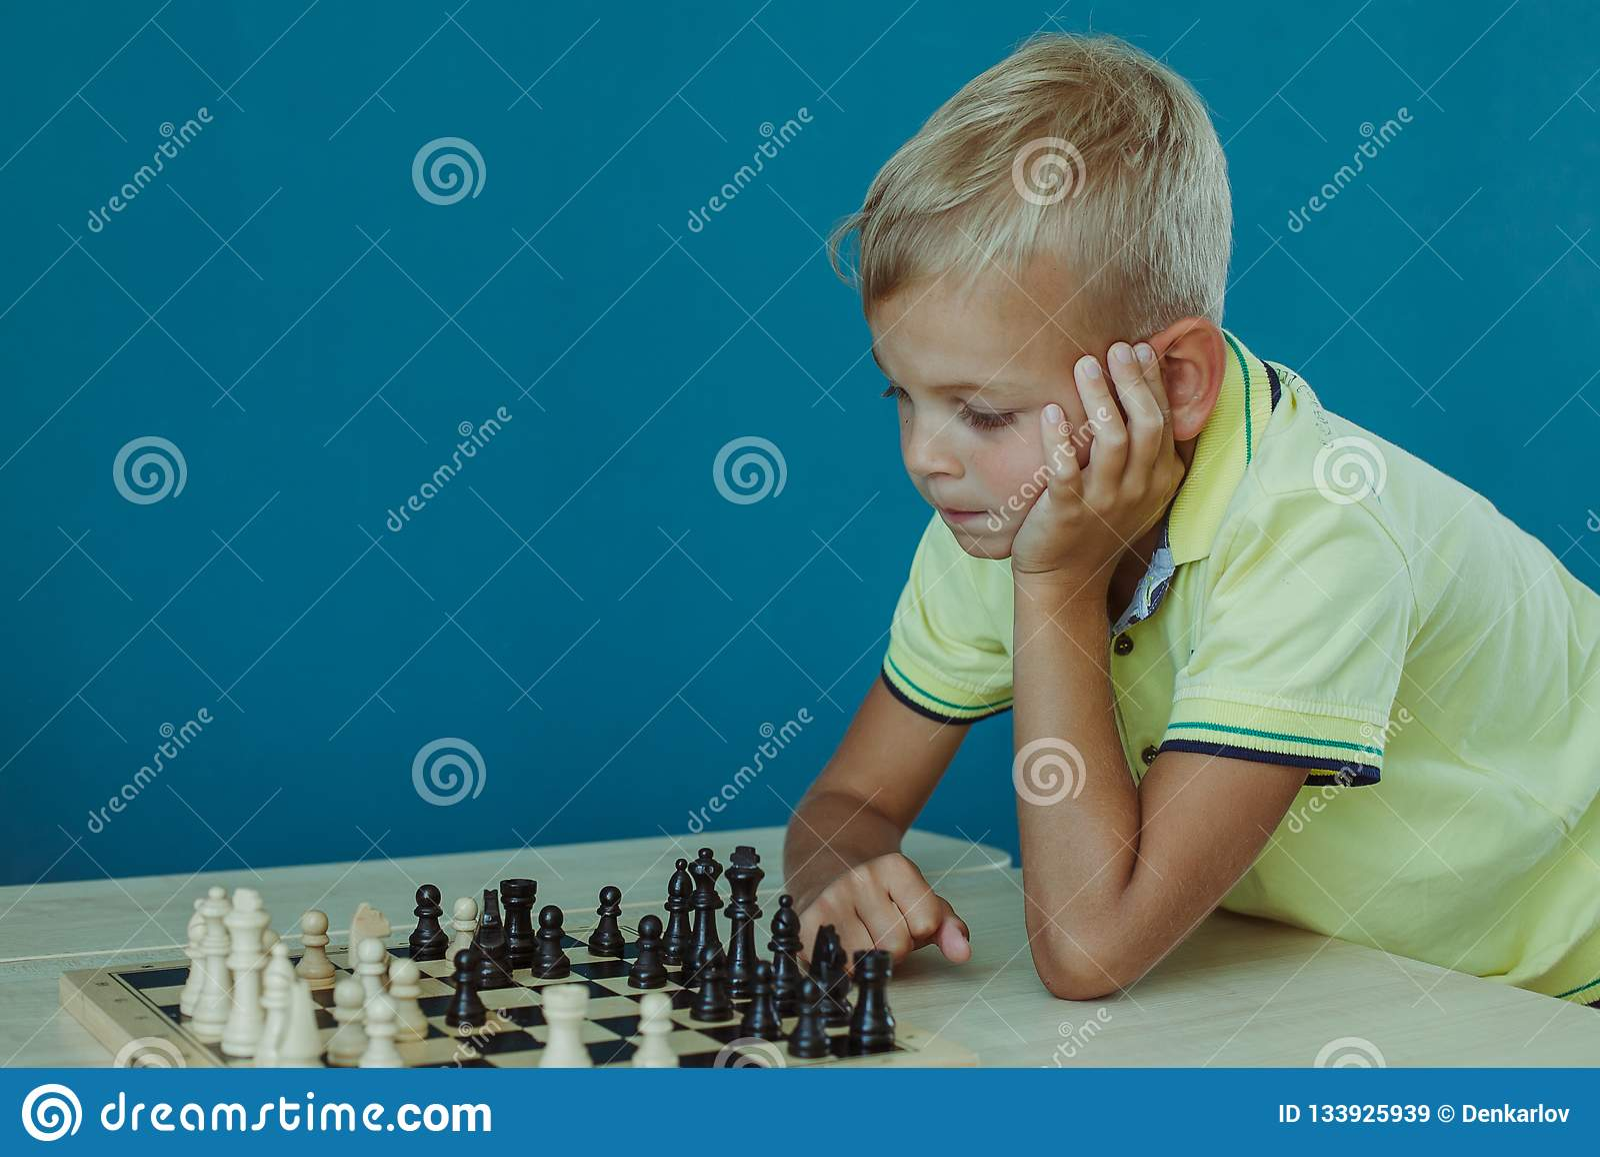 Kinderheimausbildung